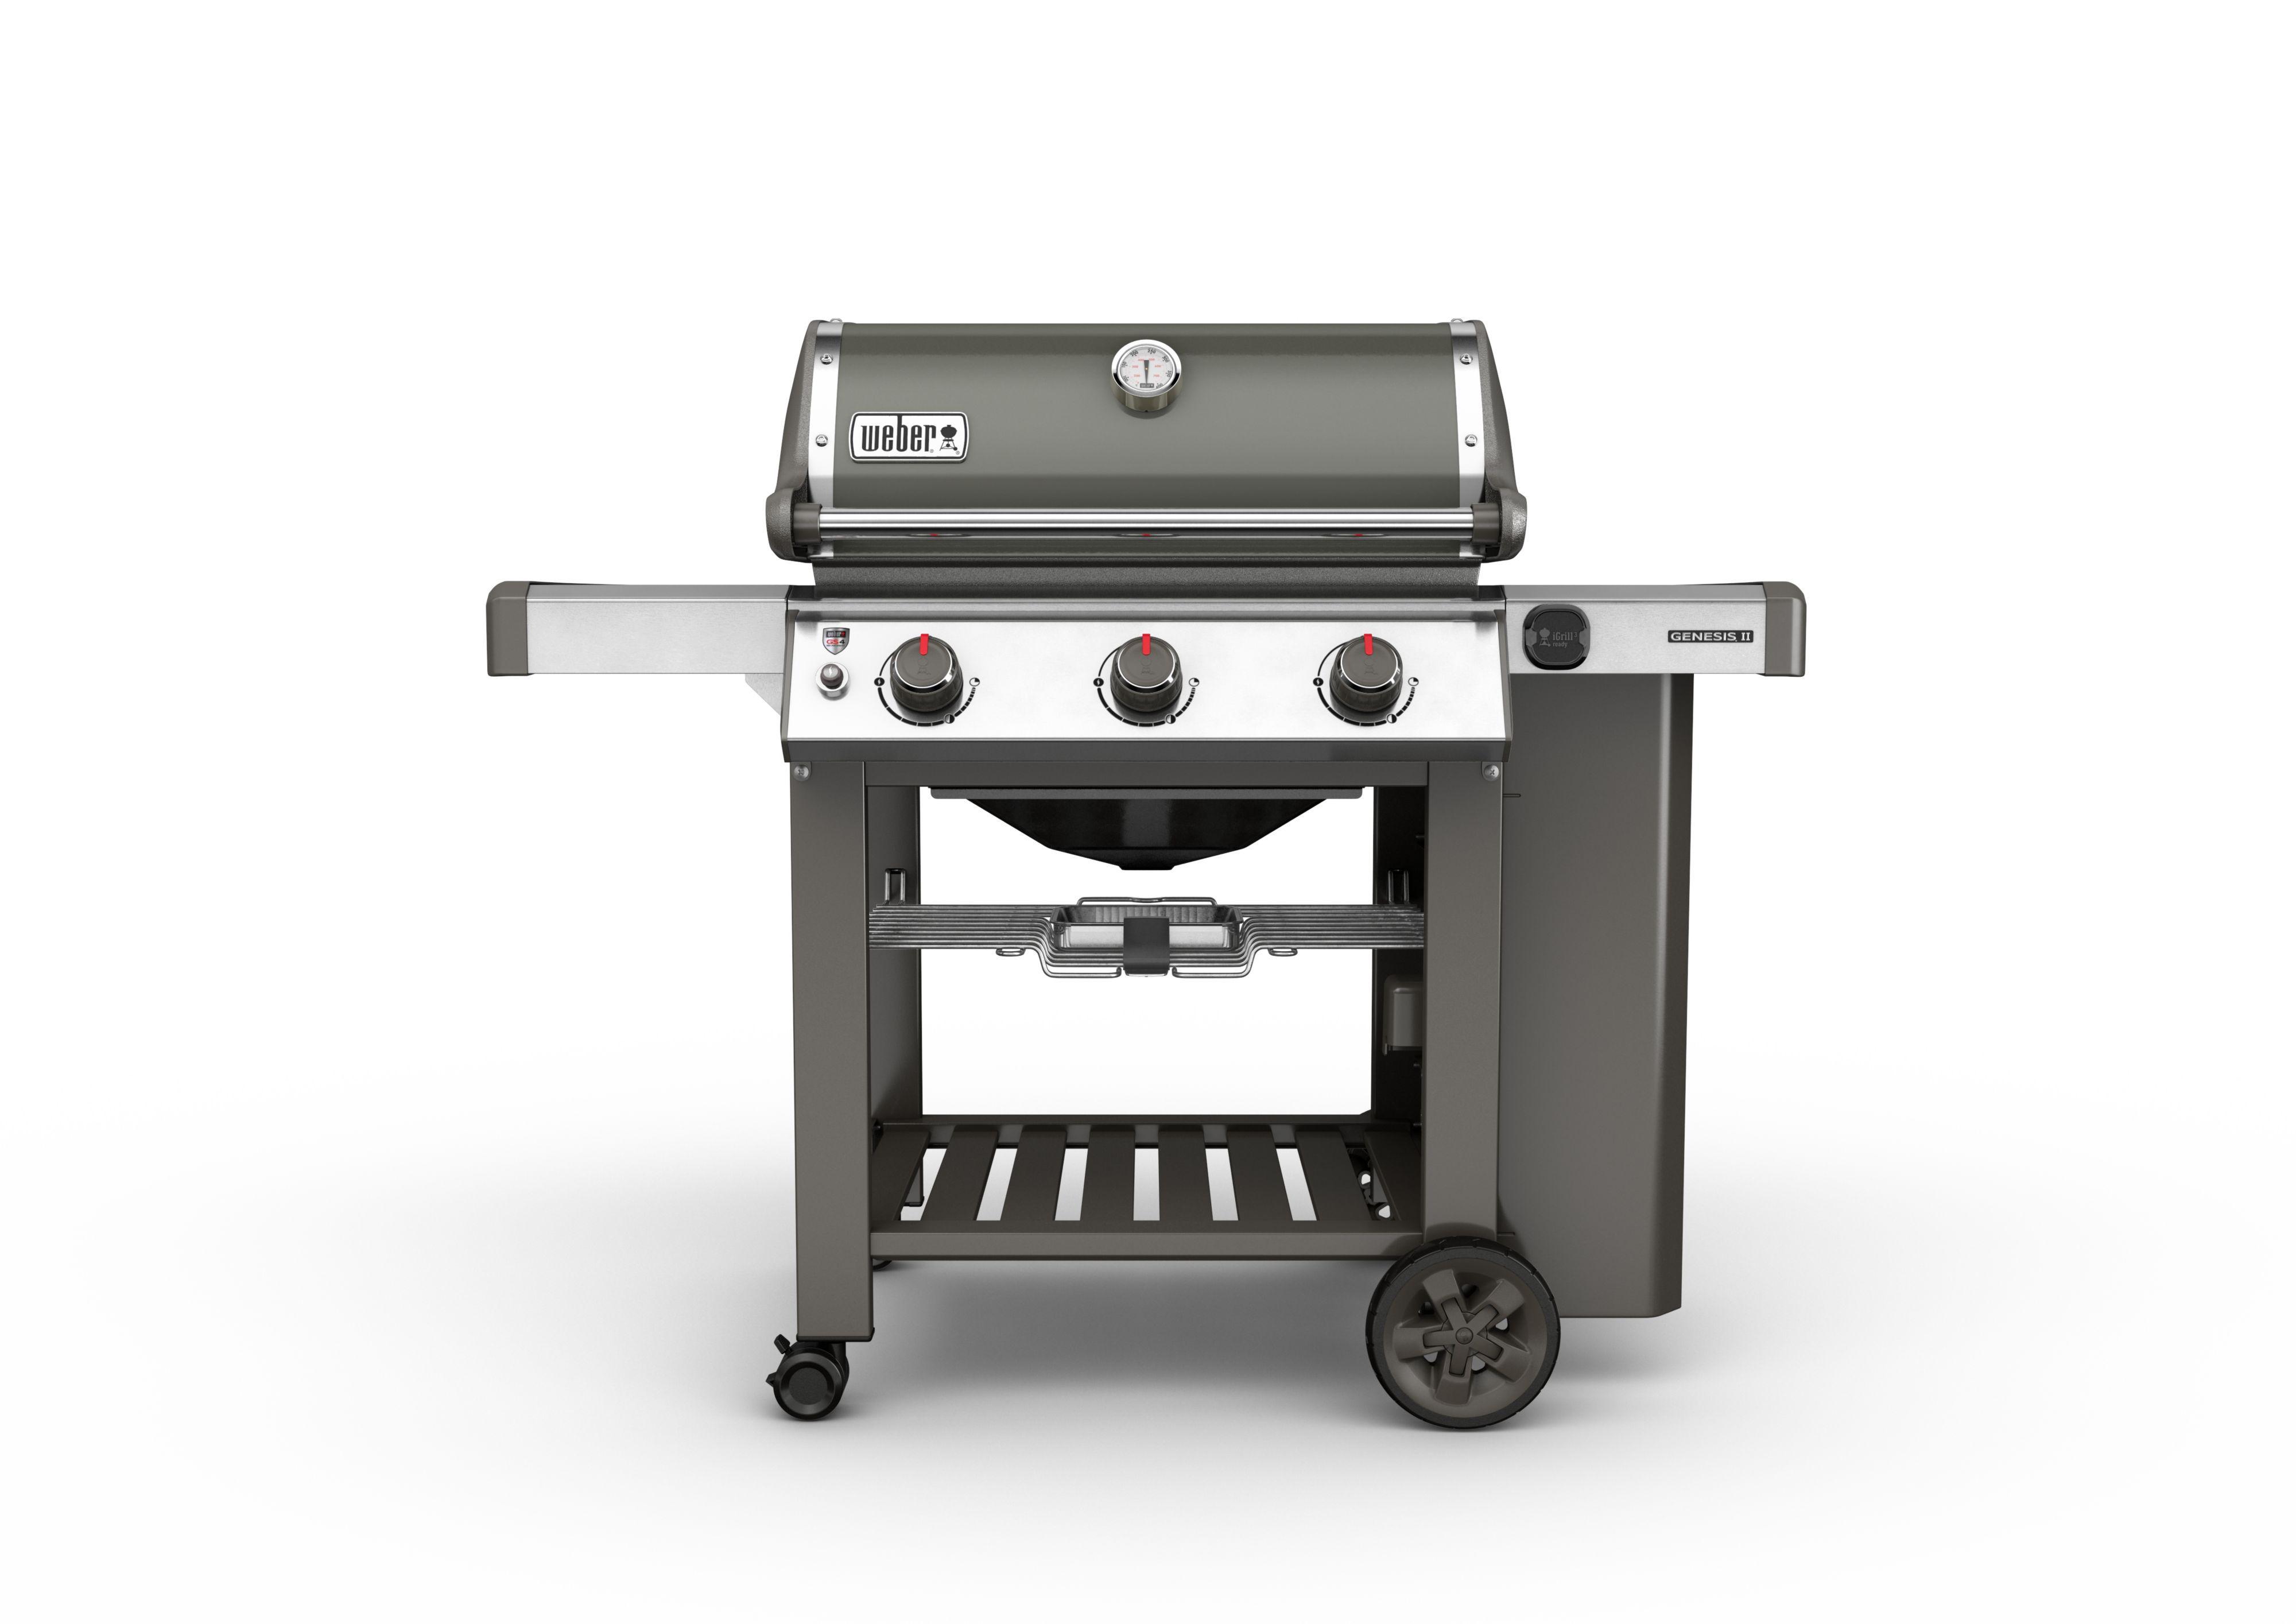 weber genesis ii e310 gbs 3 burner gas barbecue departments tradepoint. Black Bedroom Furniture Sets. Home Design Ideas